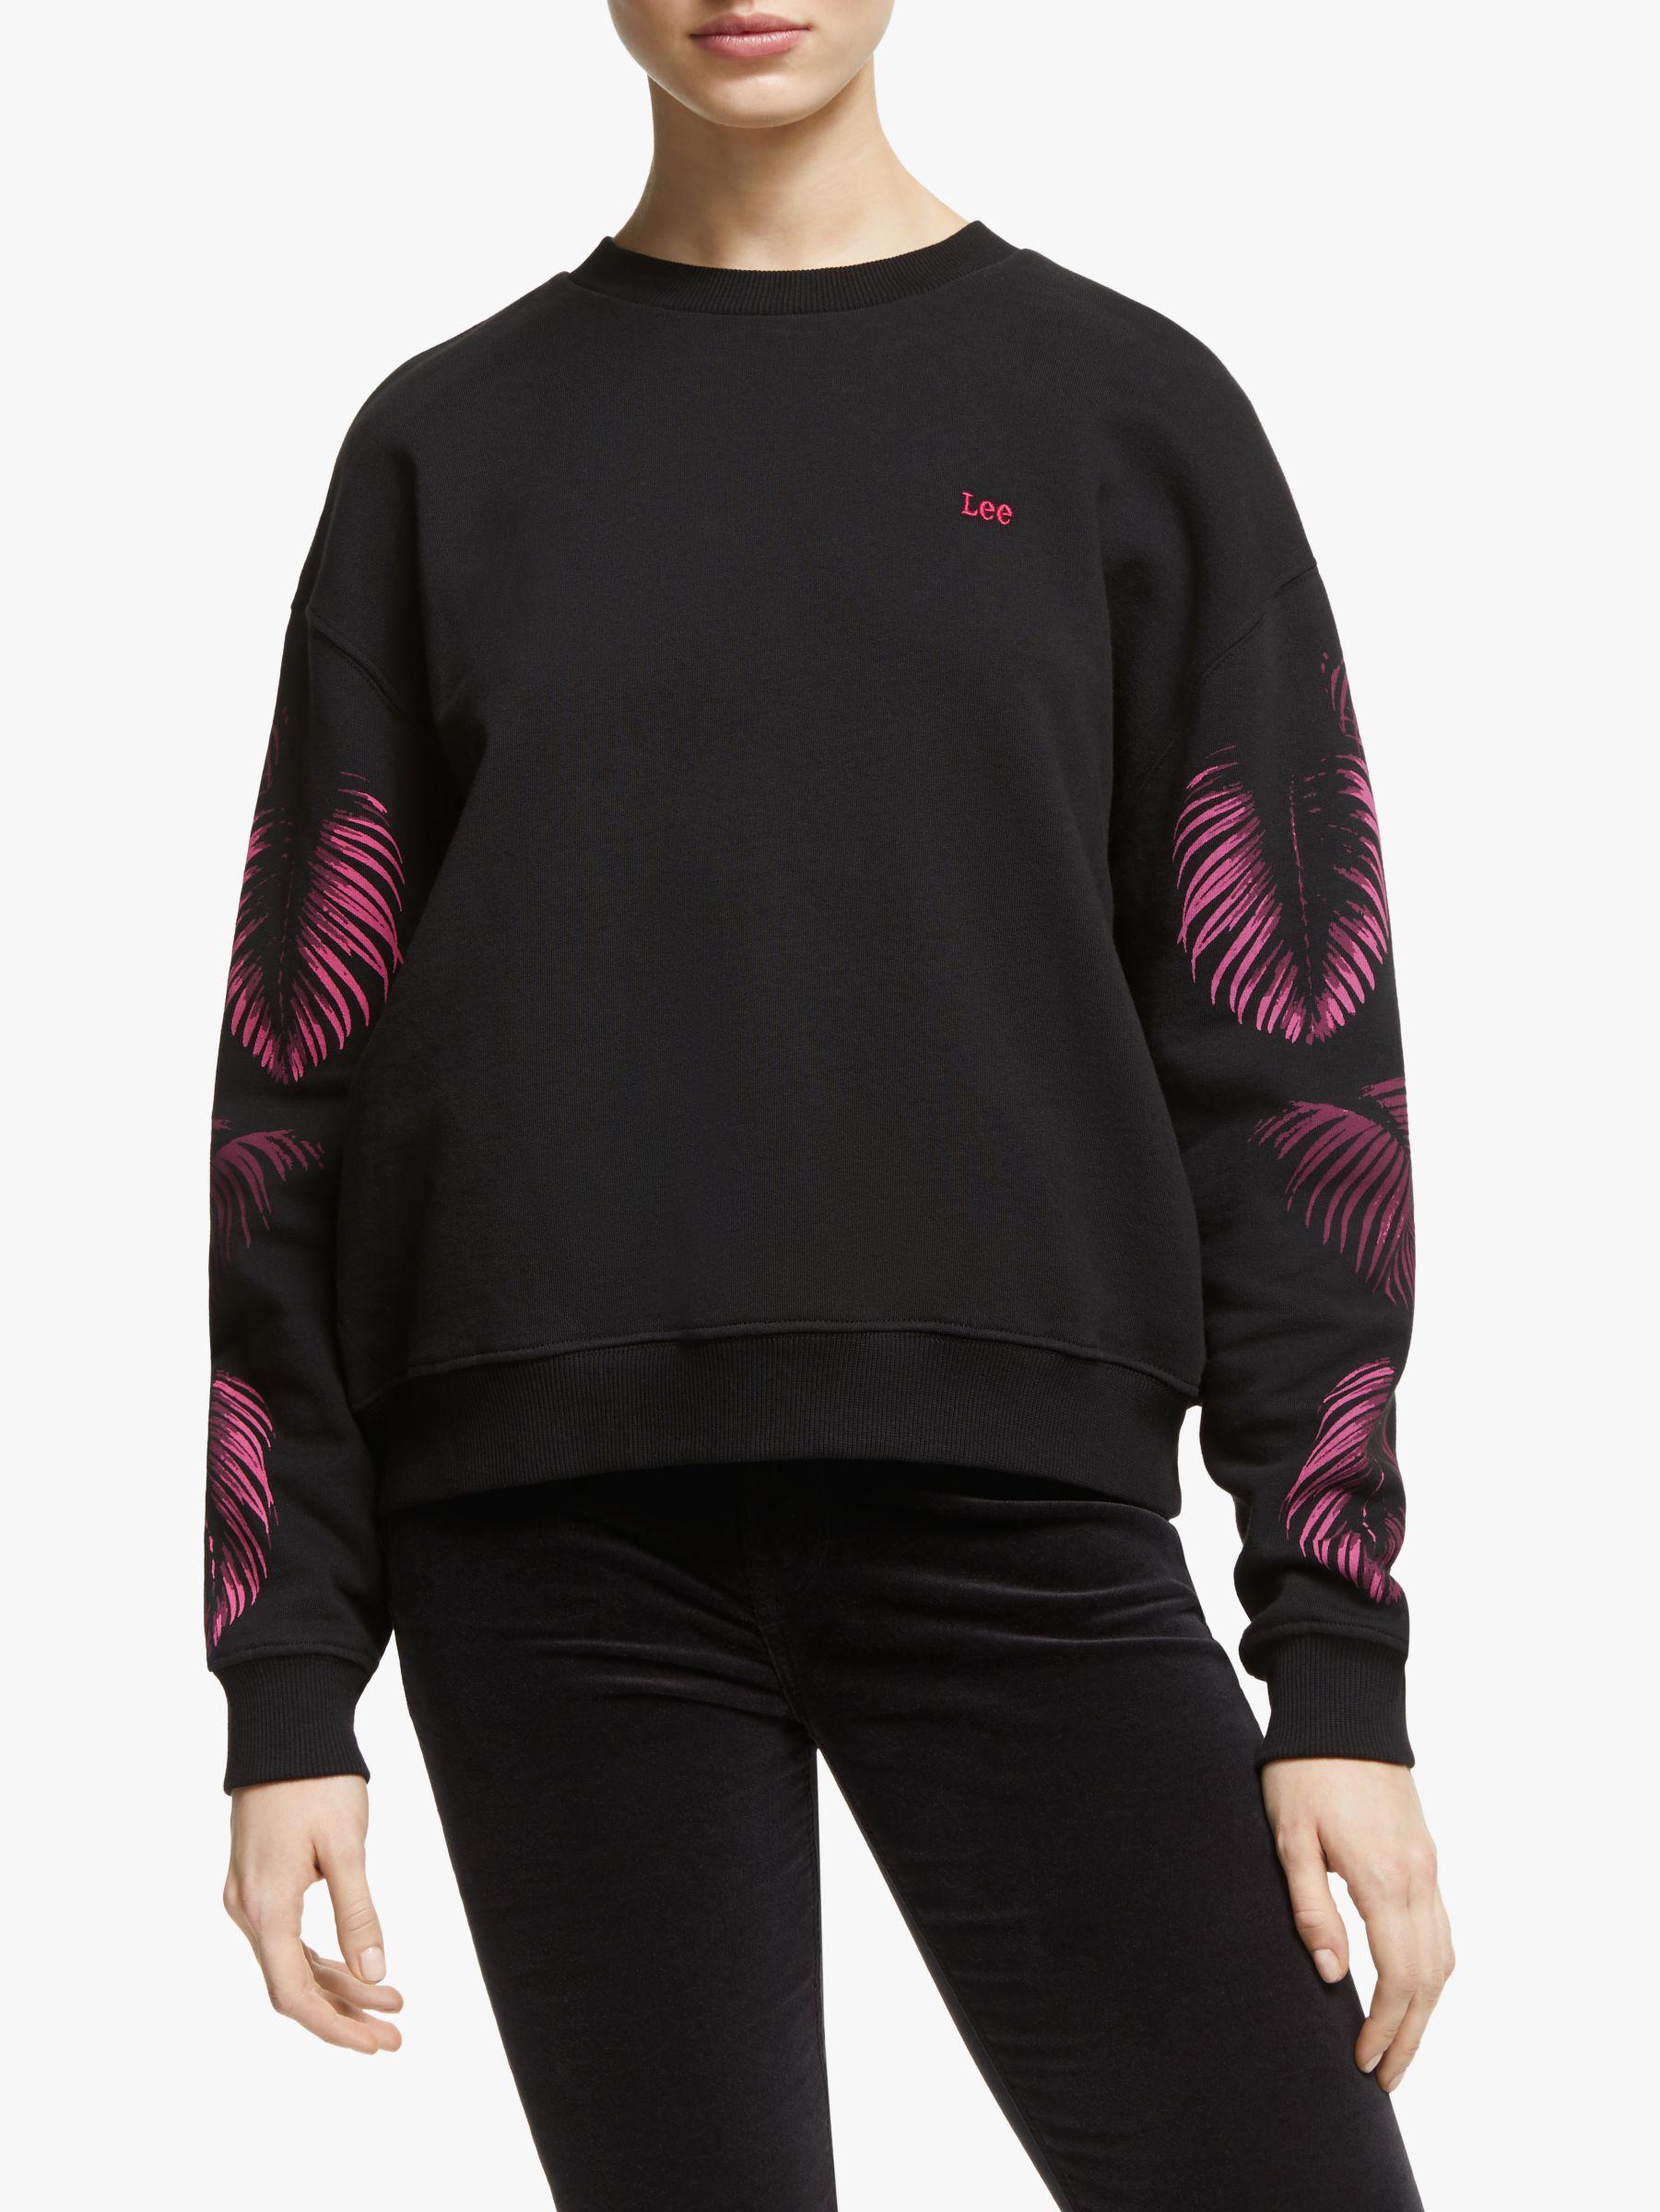 Lee Lee Botanical Sweatshirt, Black